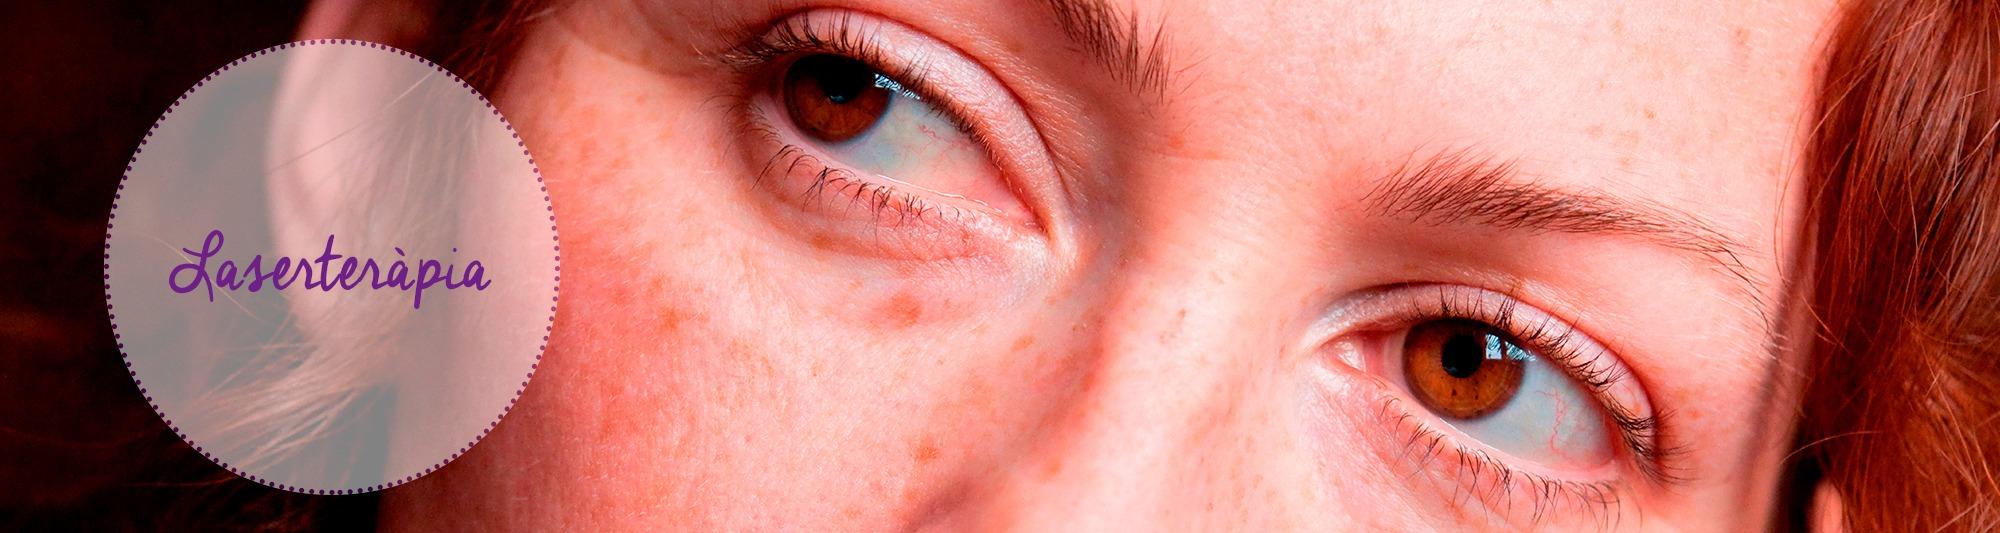 laserterapia, reumatologia, acne, cicatrius, andorra,